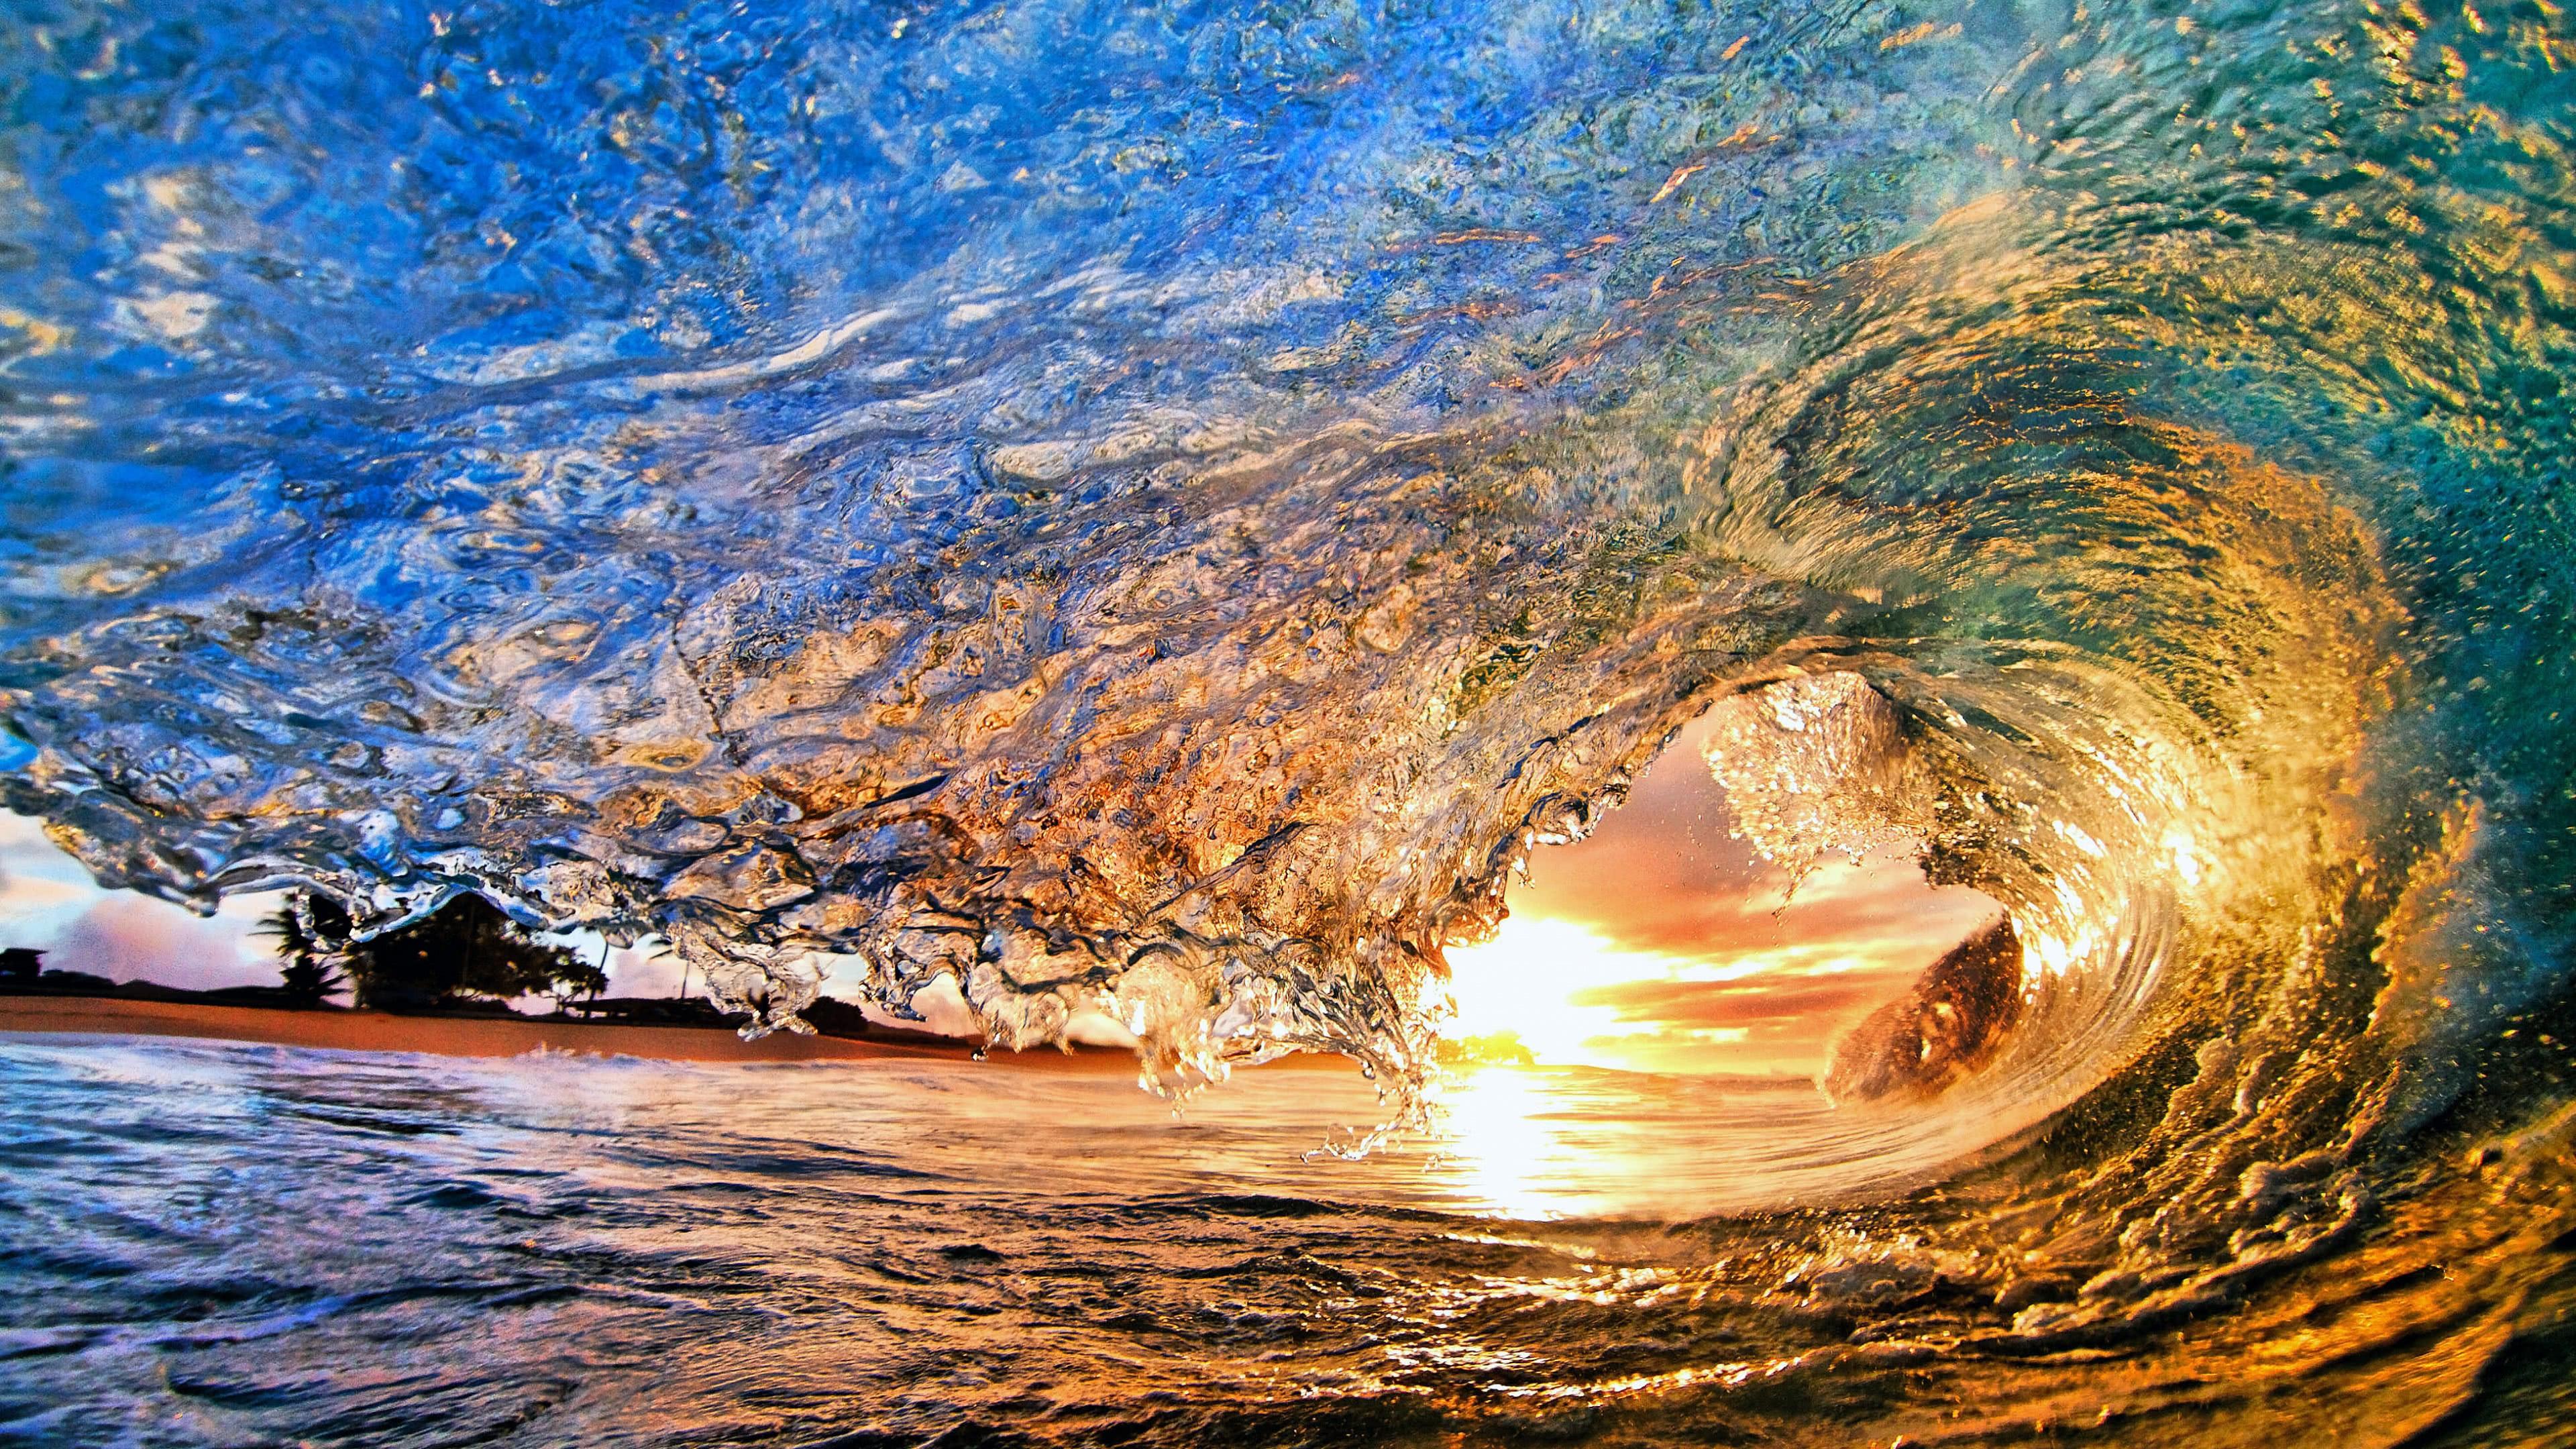 ocean wave hawaii united states uhd 4k wallpaper